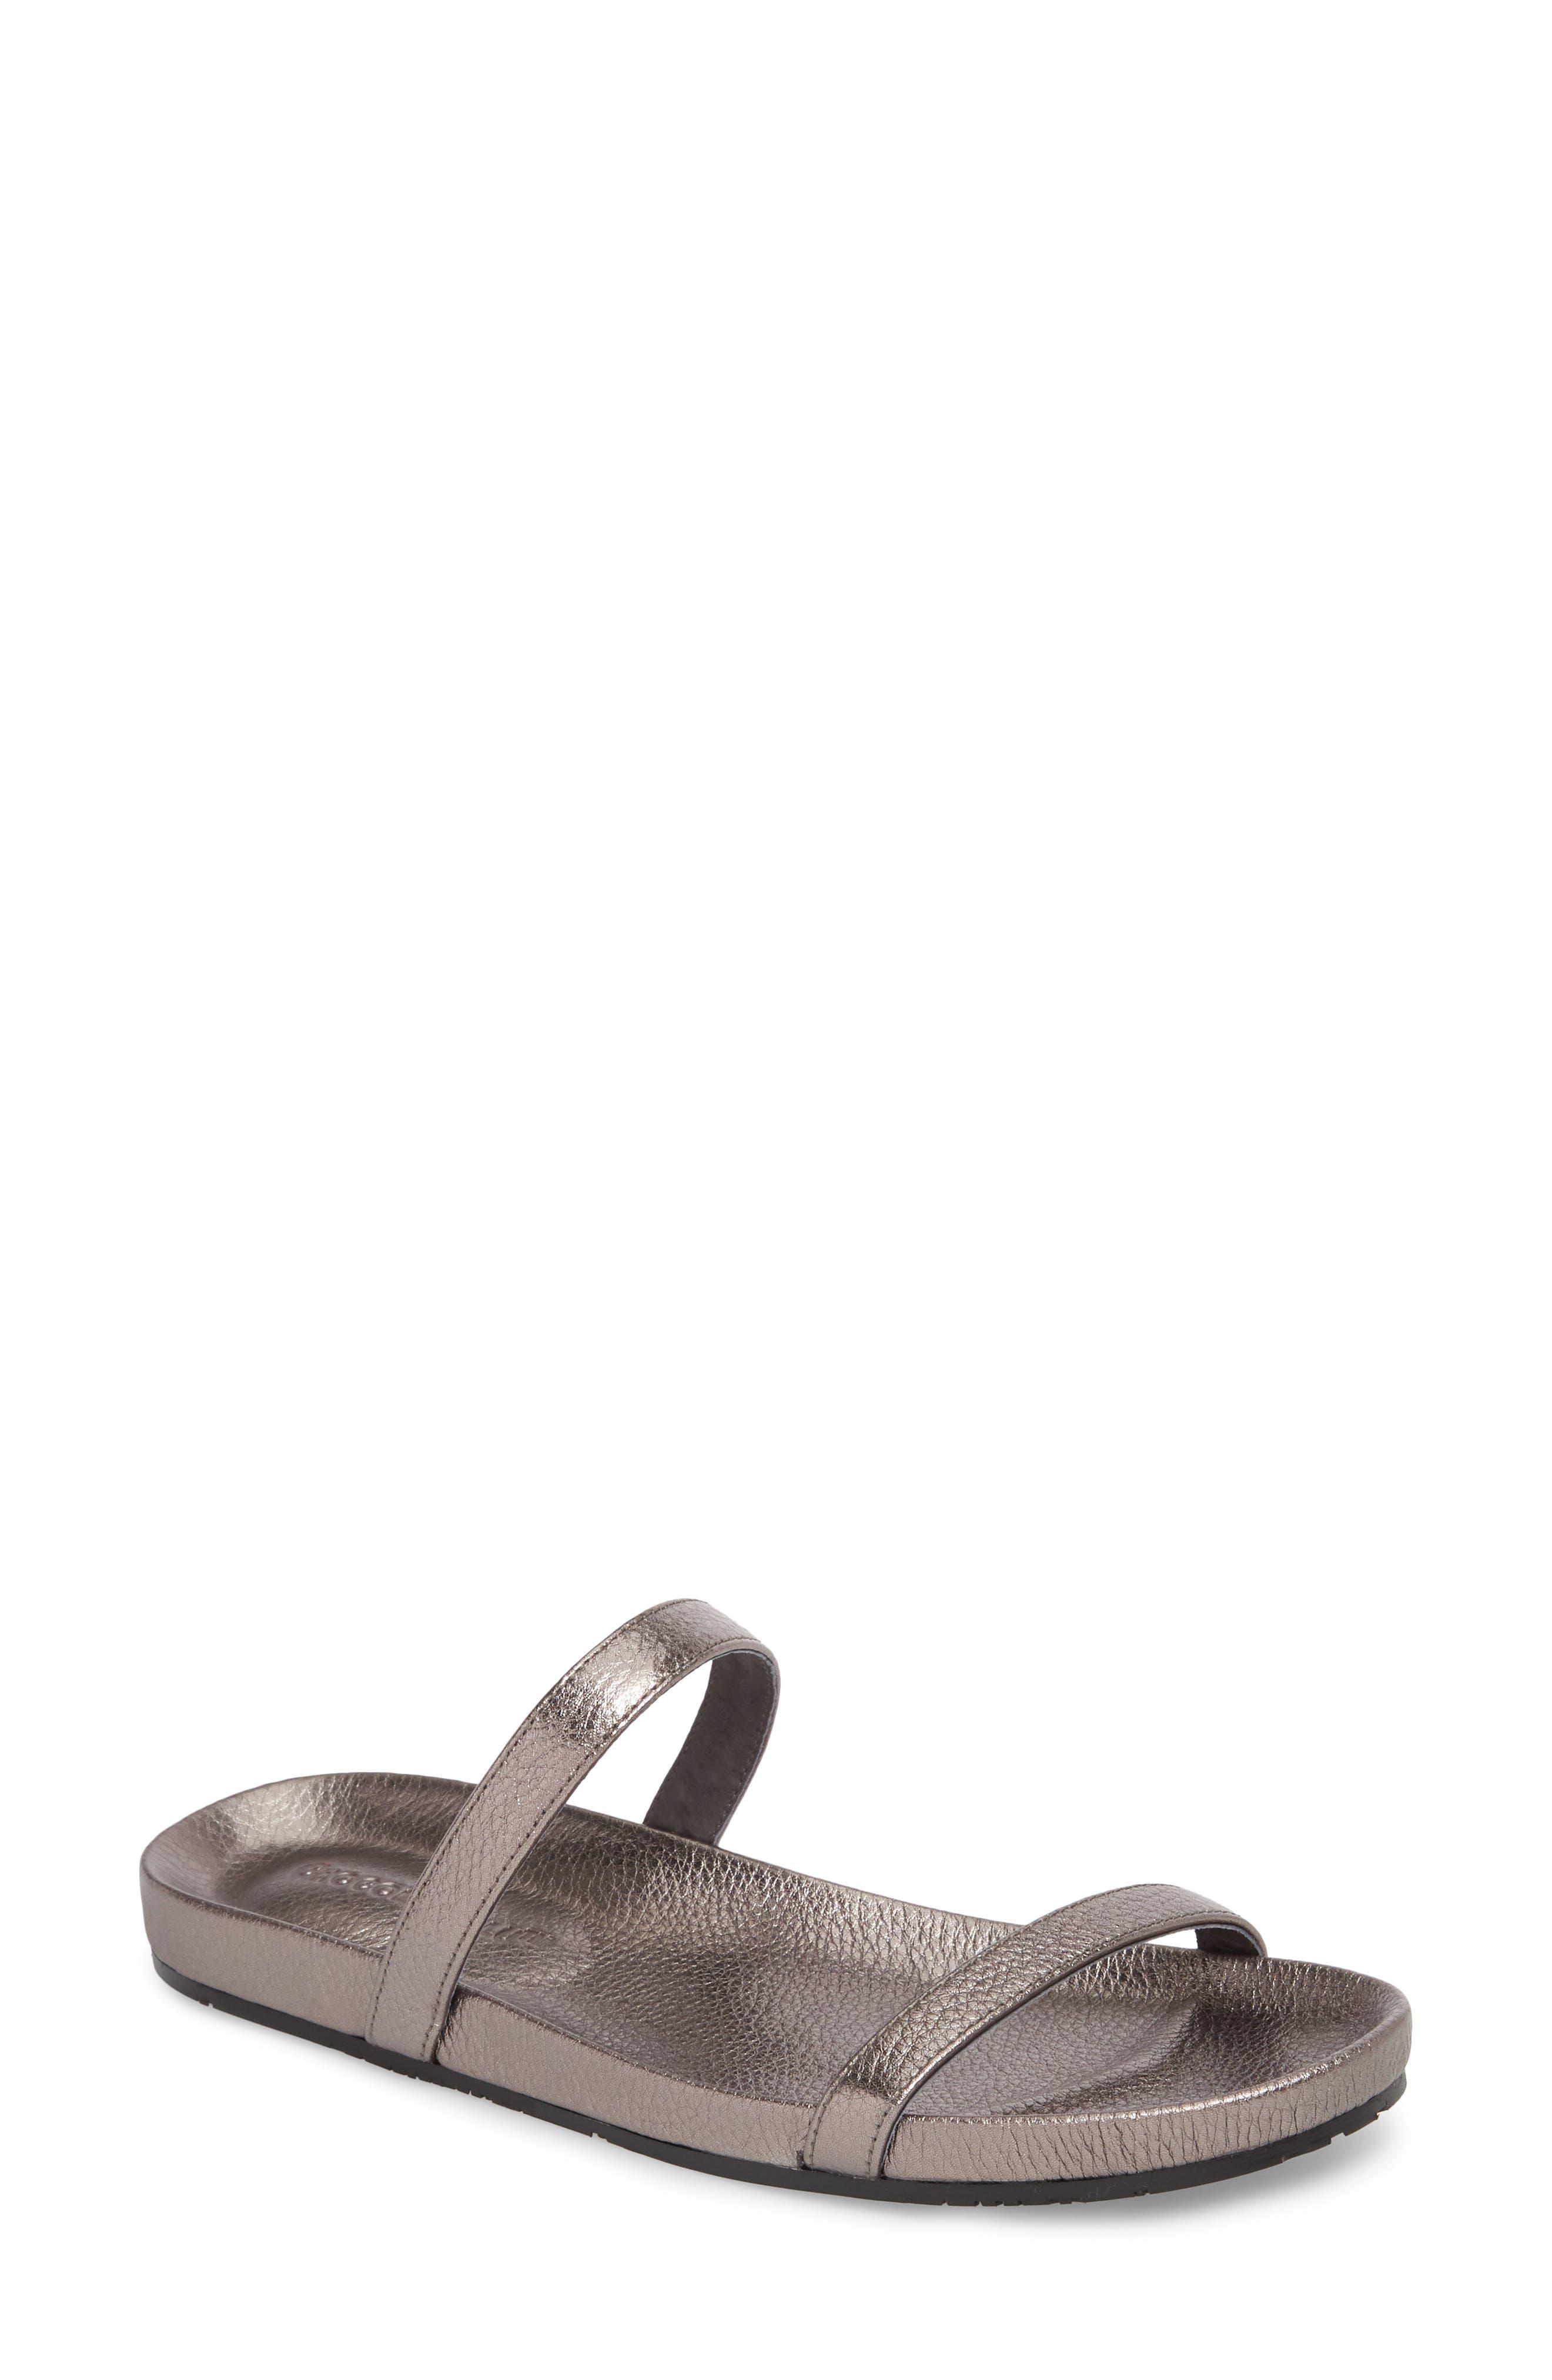 Chocolat Blu Yale Two-Strap Sandal, Metallic